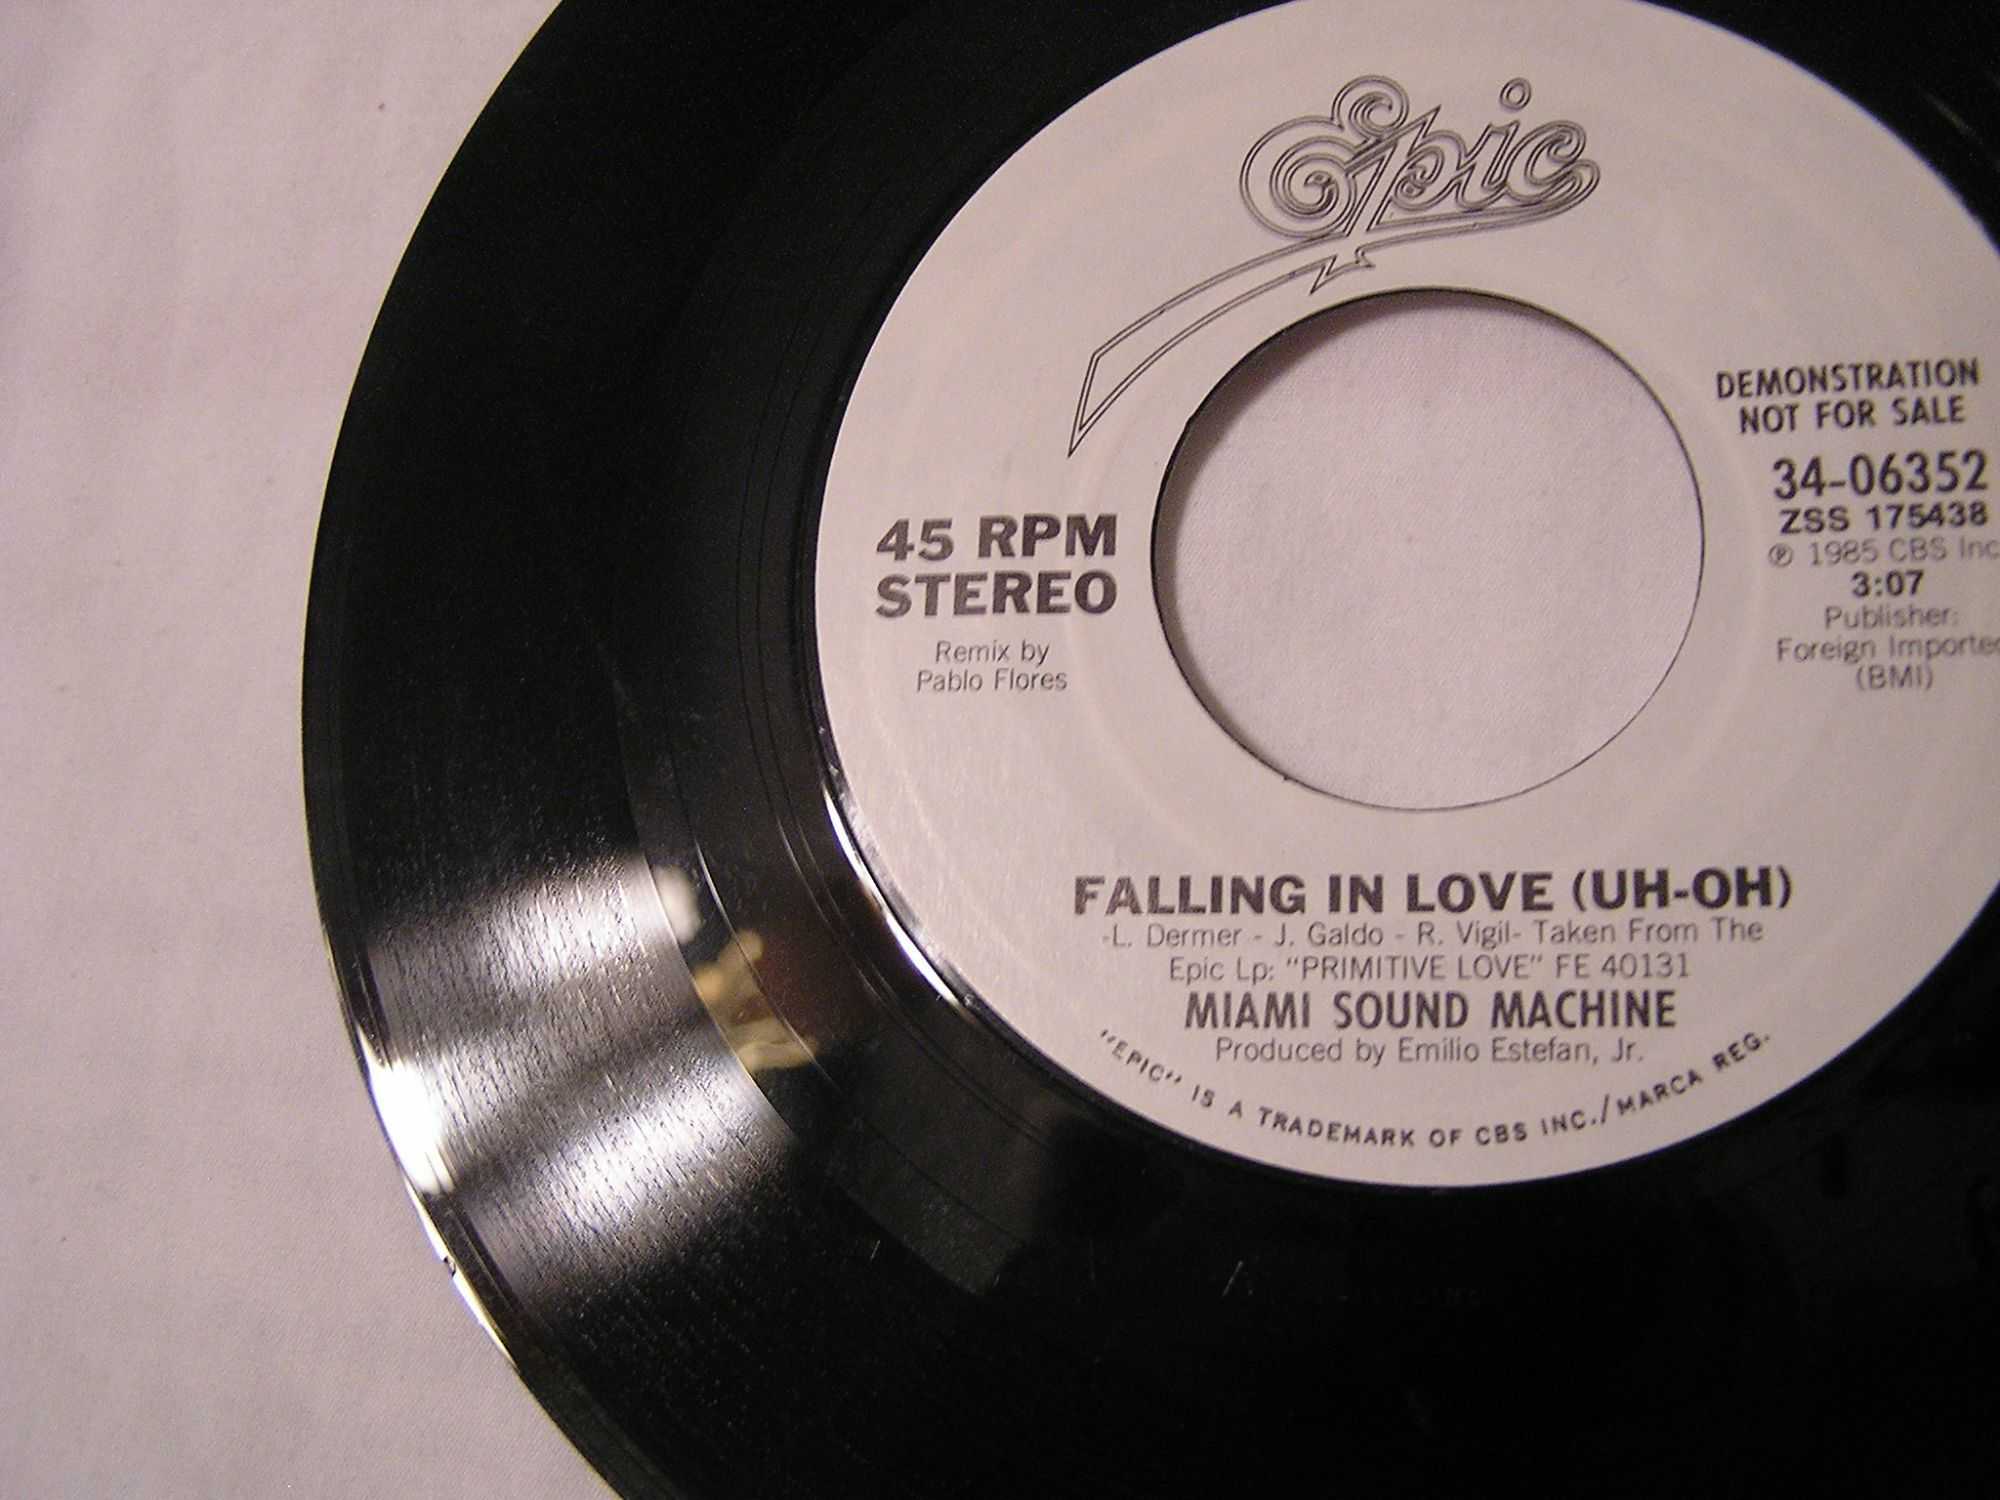 Miami Sound Machine FALLING IN LOVE (UH-OH) [Single Remix